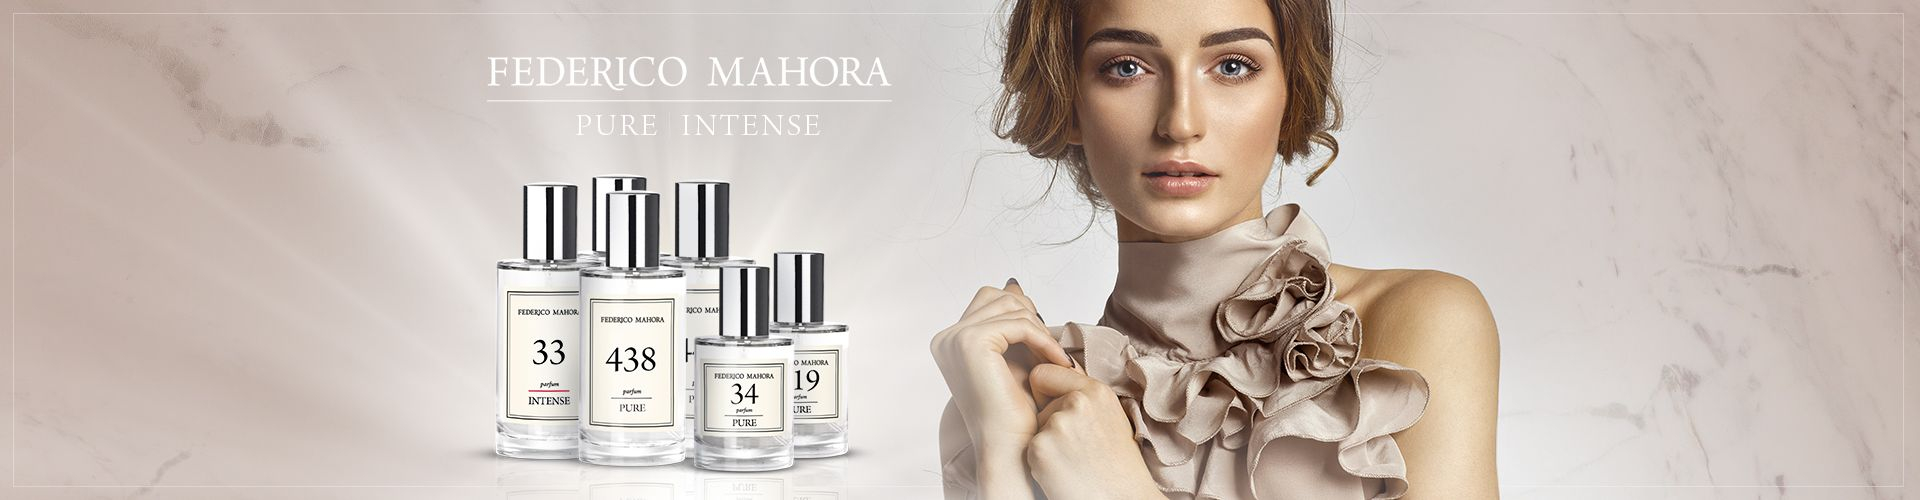 FM cosmetics perfume group